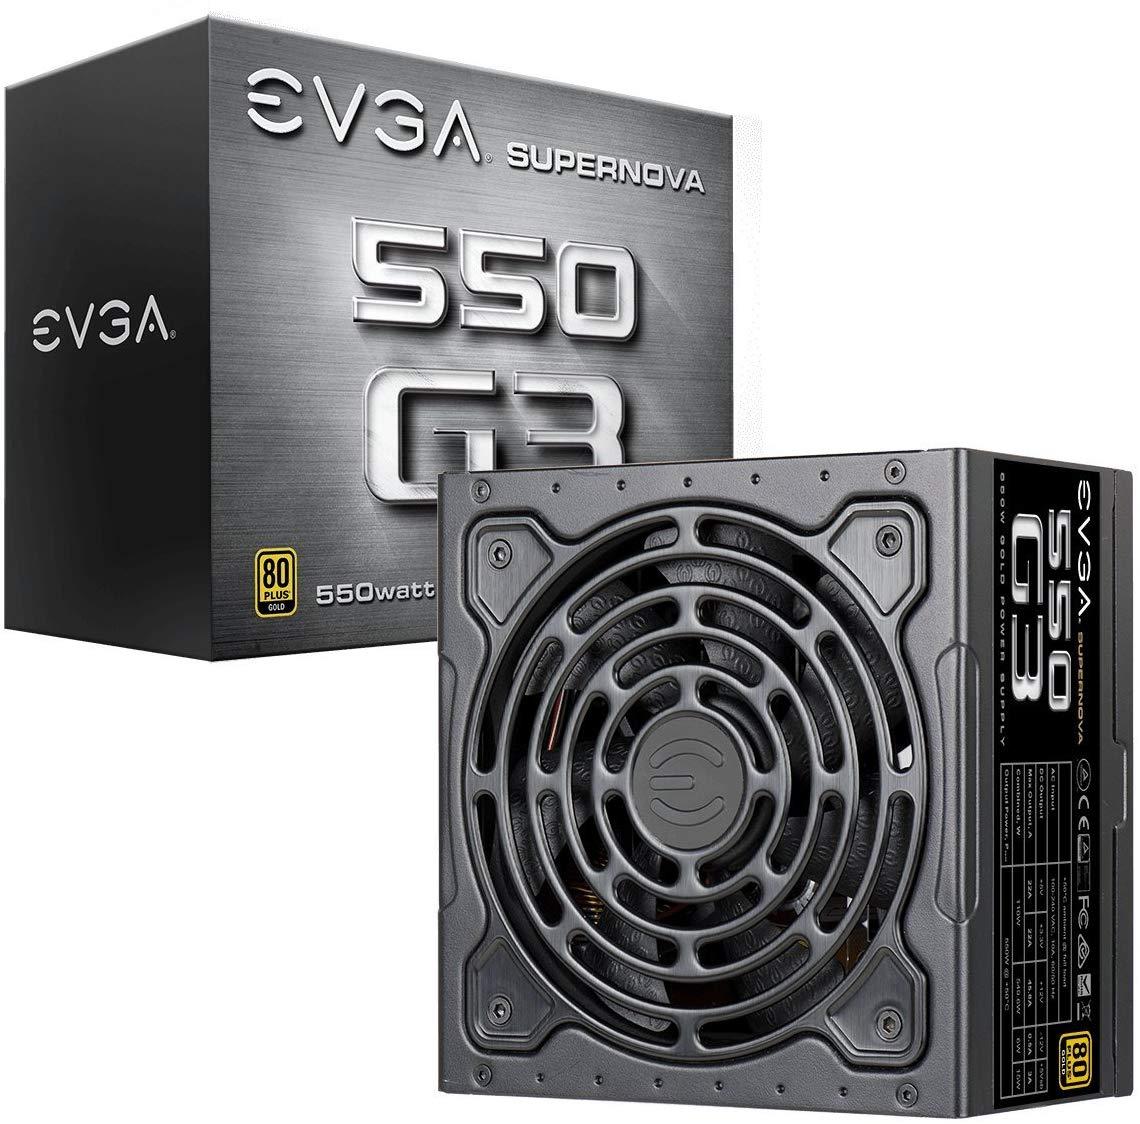 EVGA SuperNOVA 550 G3, 80 Plus Gold 550W, Fully Modular 10 Year Warranty Power Supply @ Amazon - £64.99